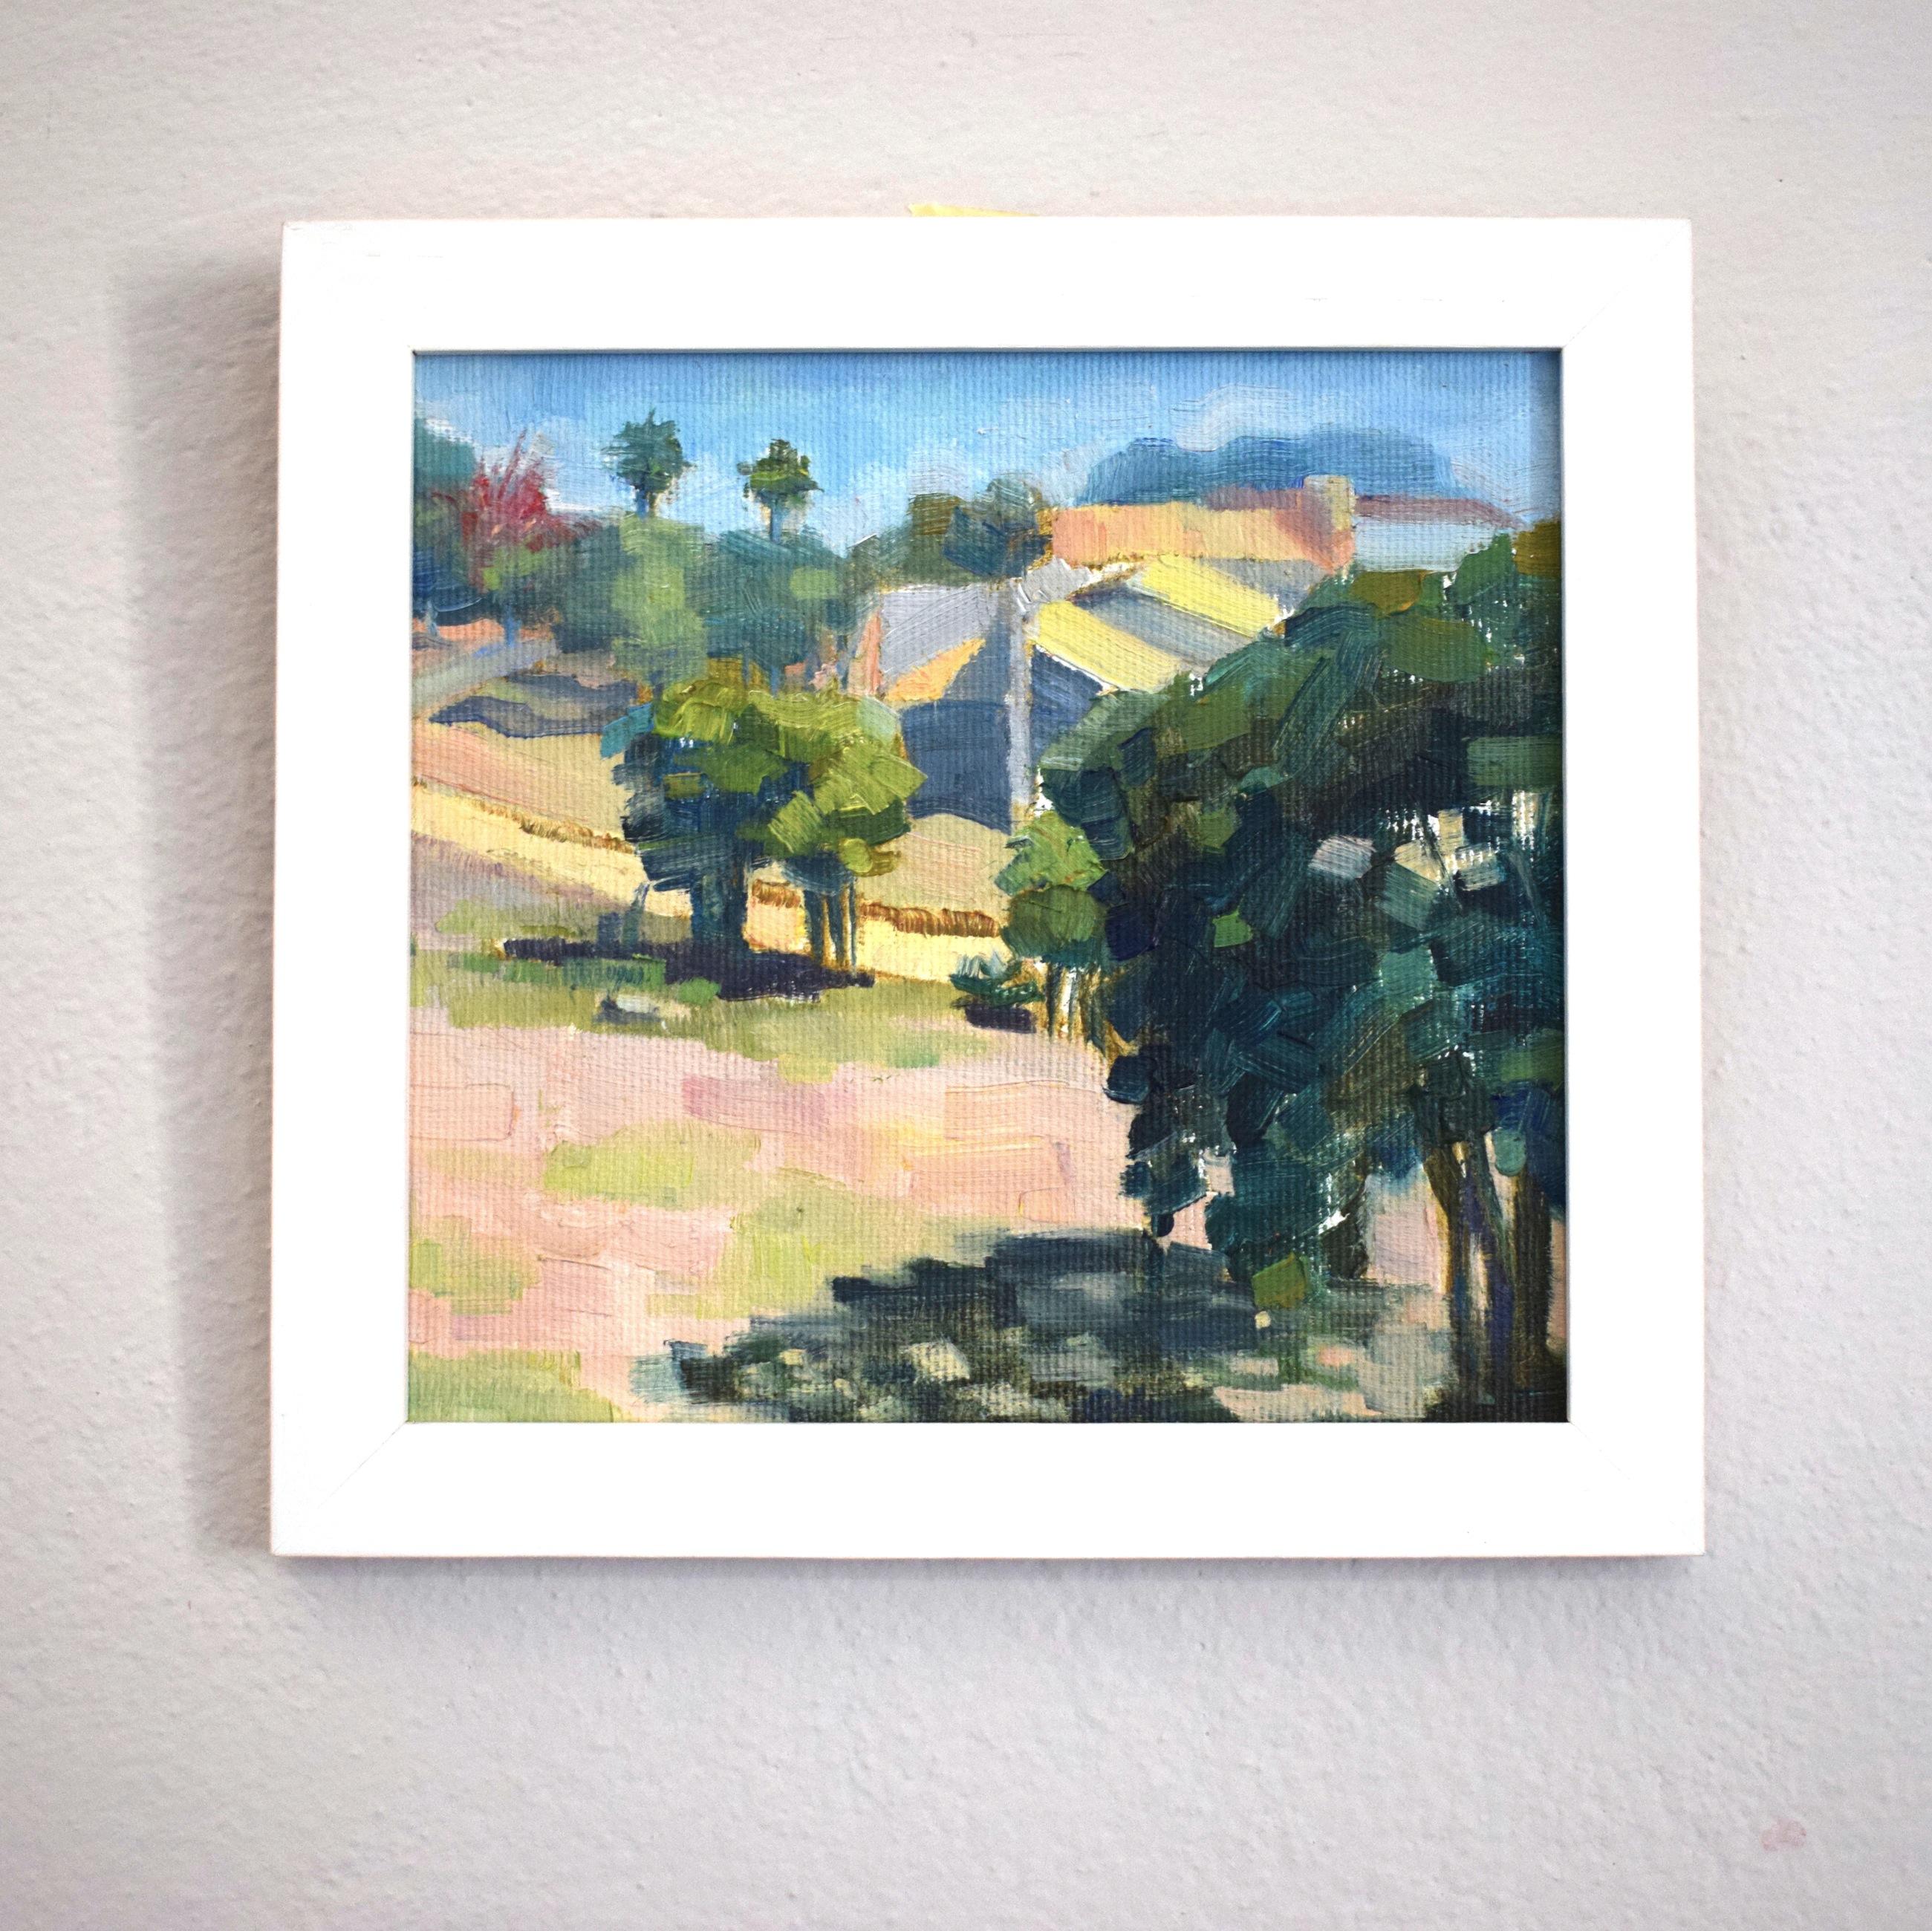 Original plein air paintings from Brazil